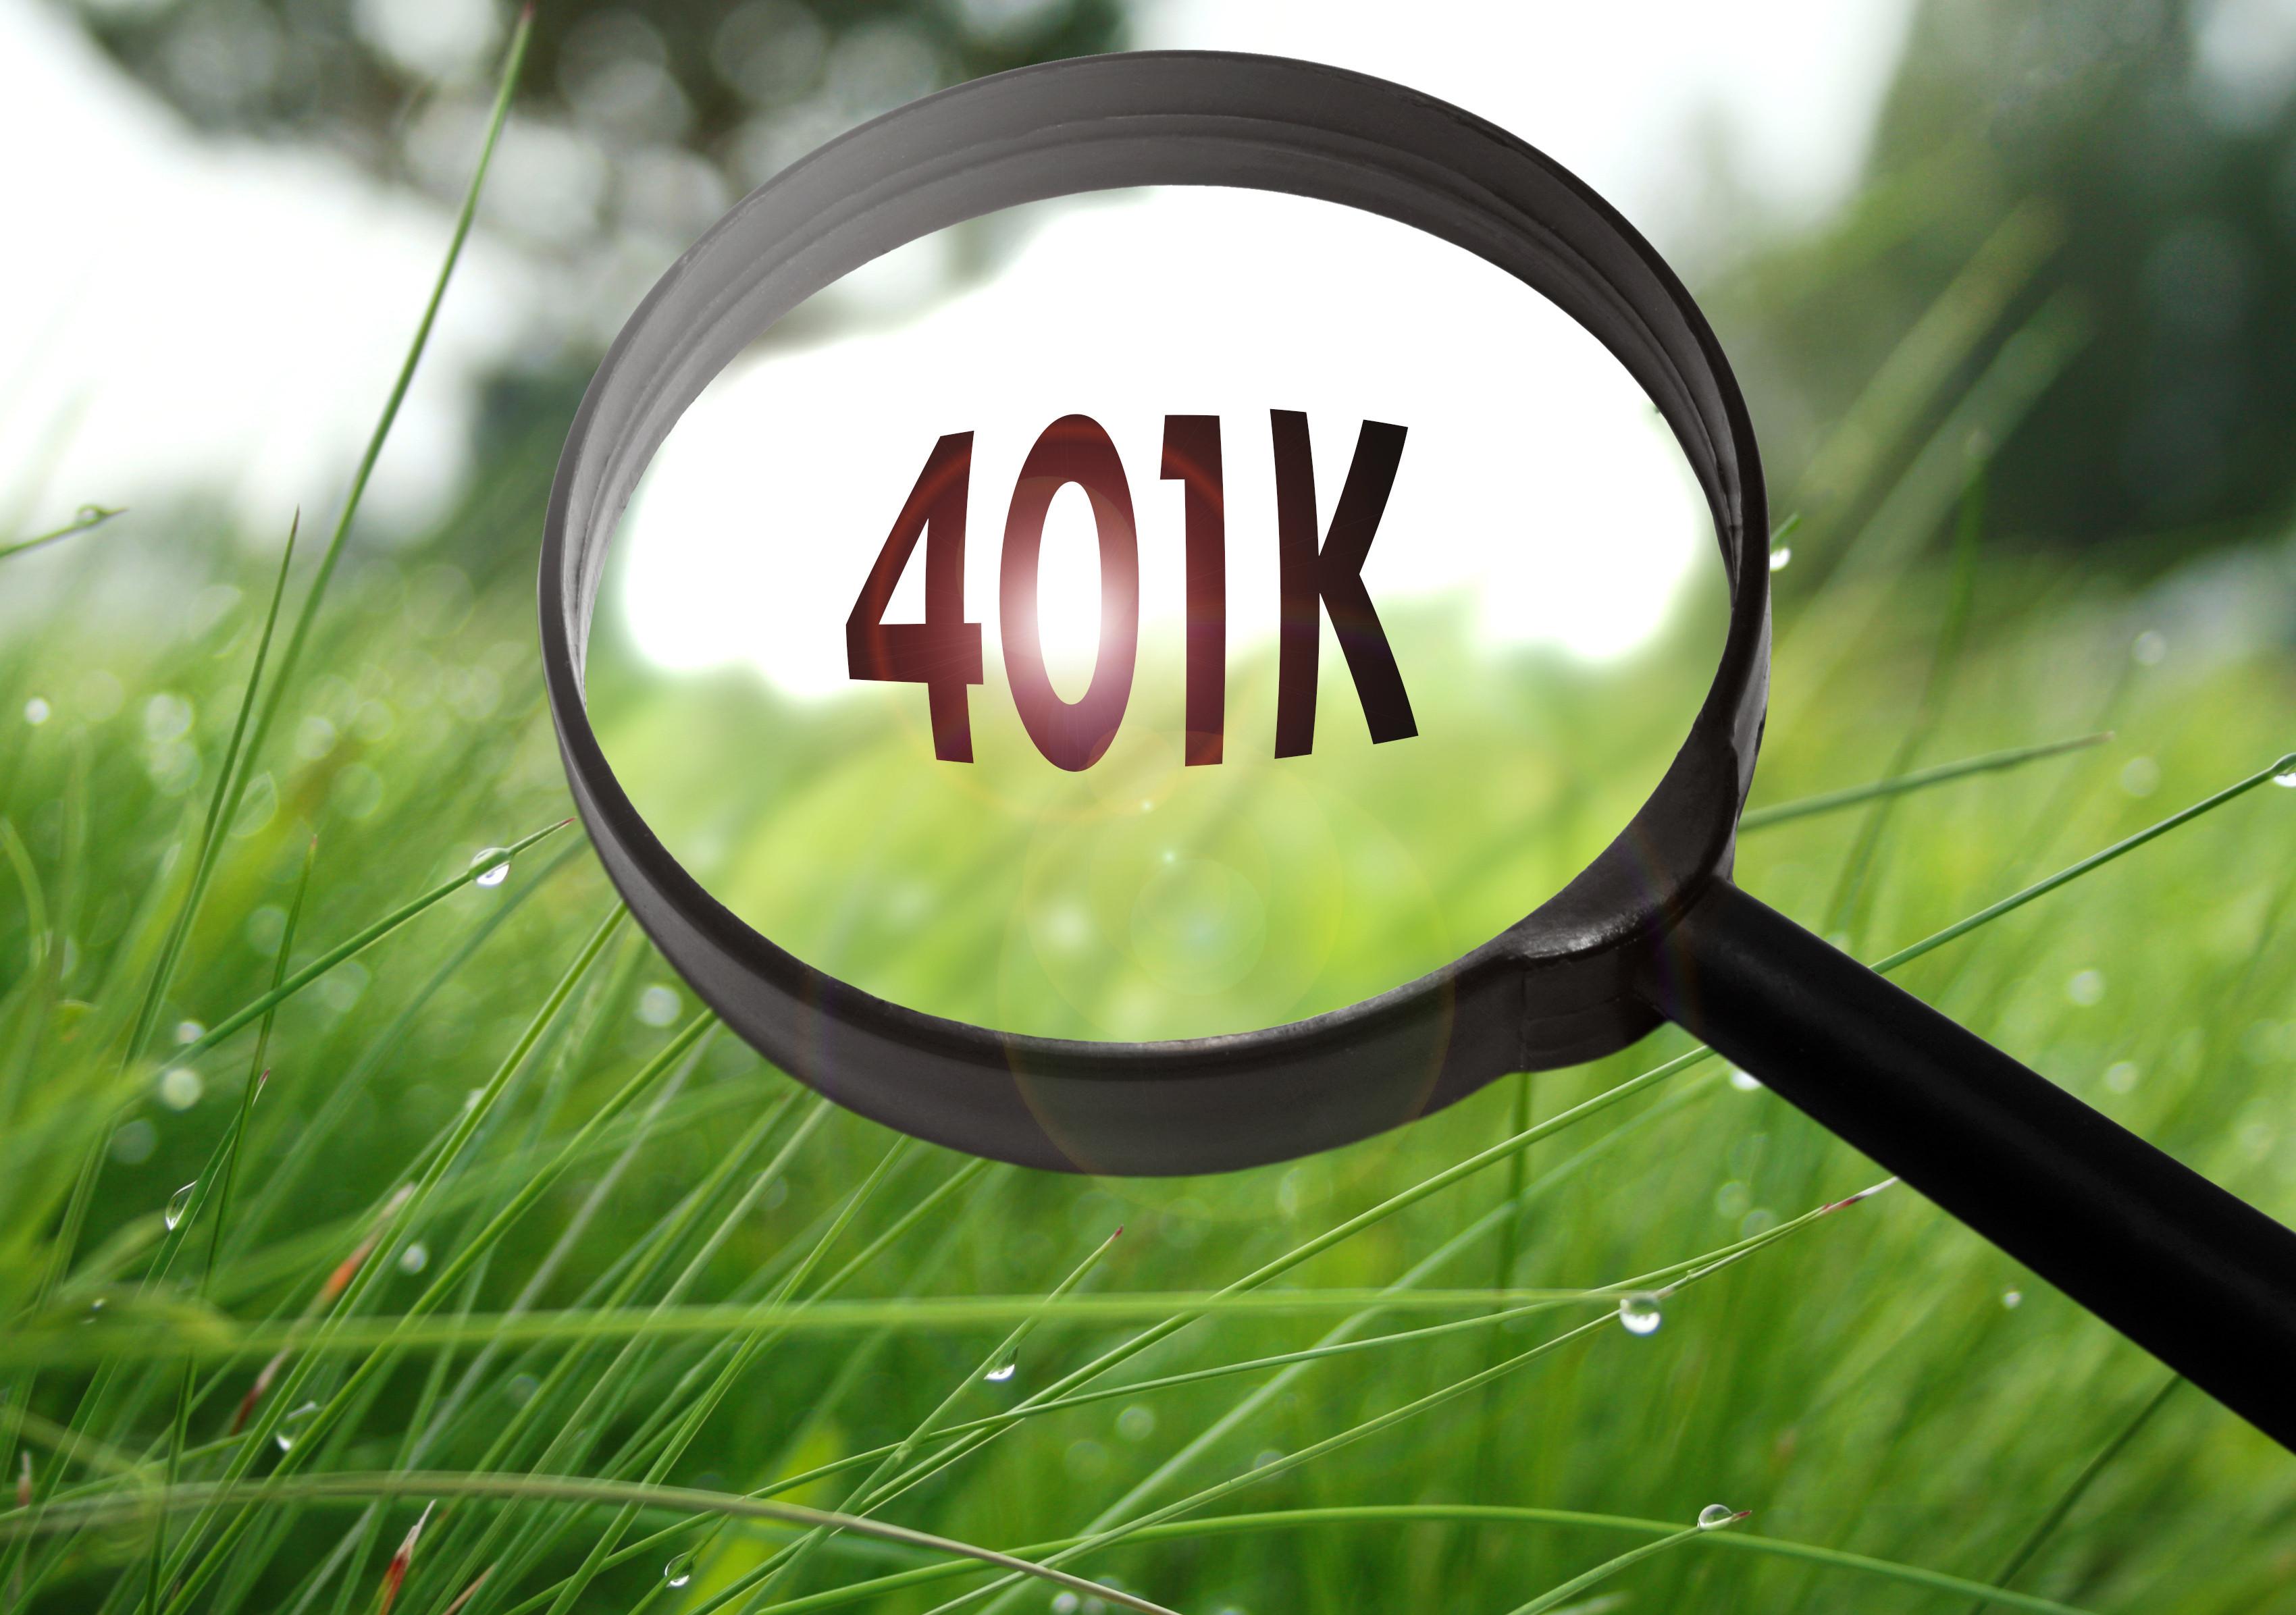 Current 401K Management